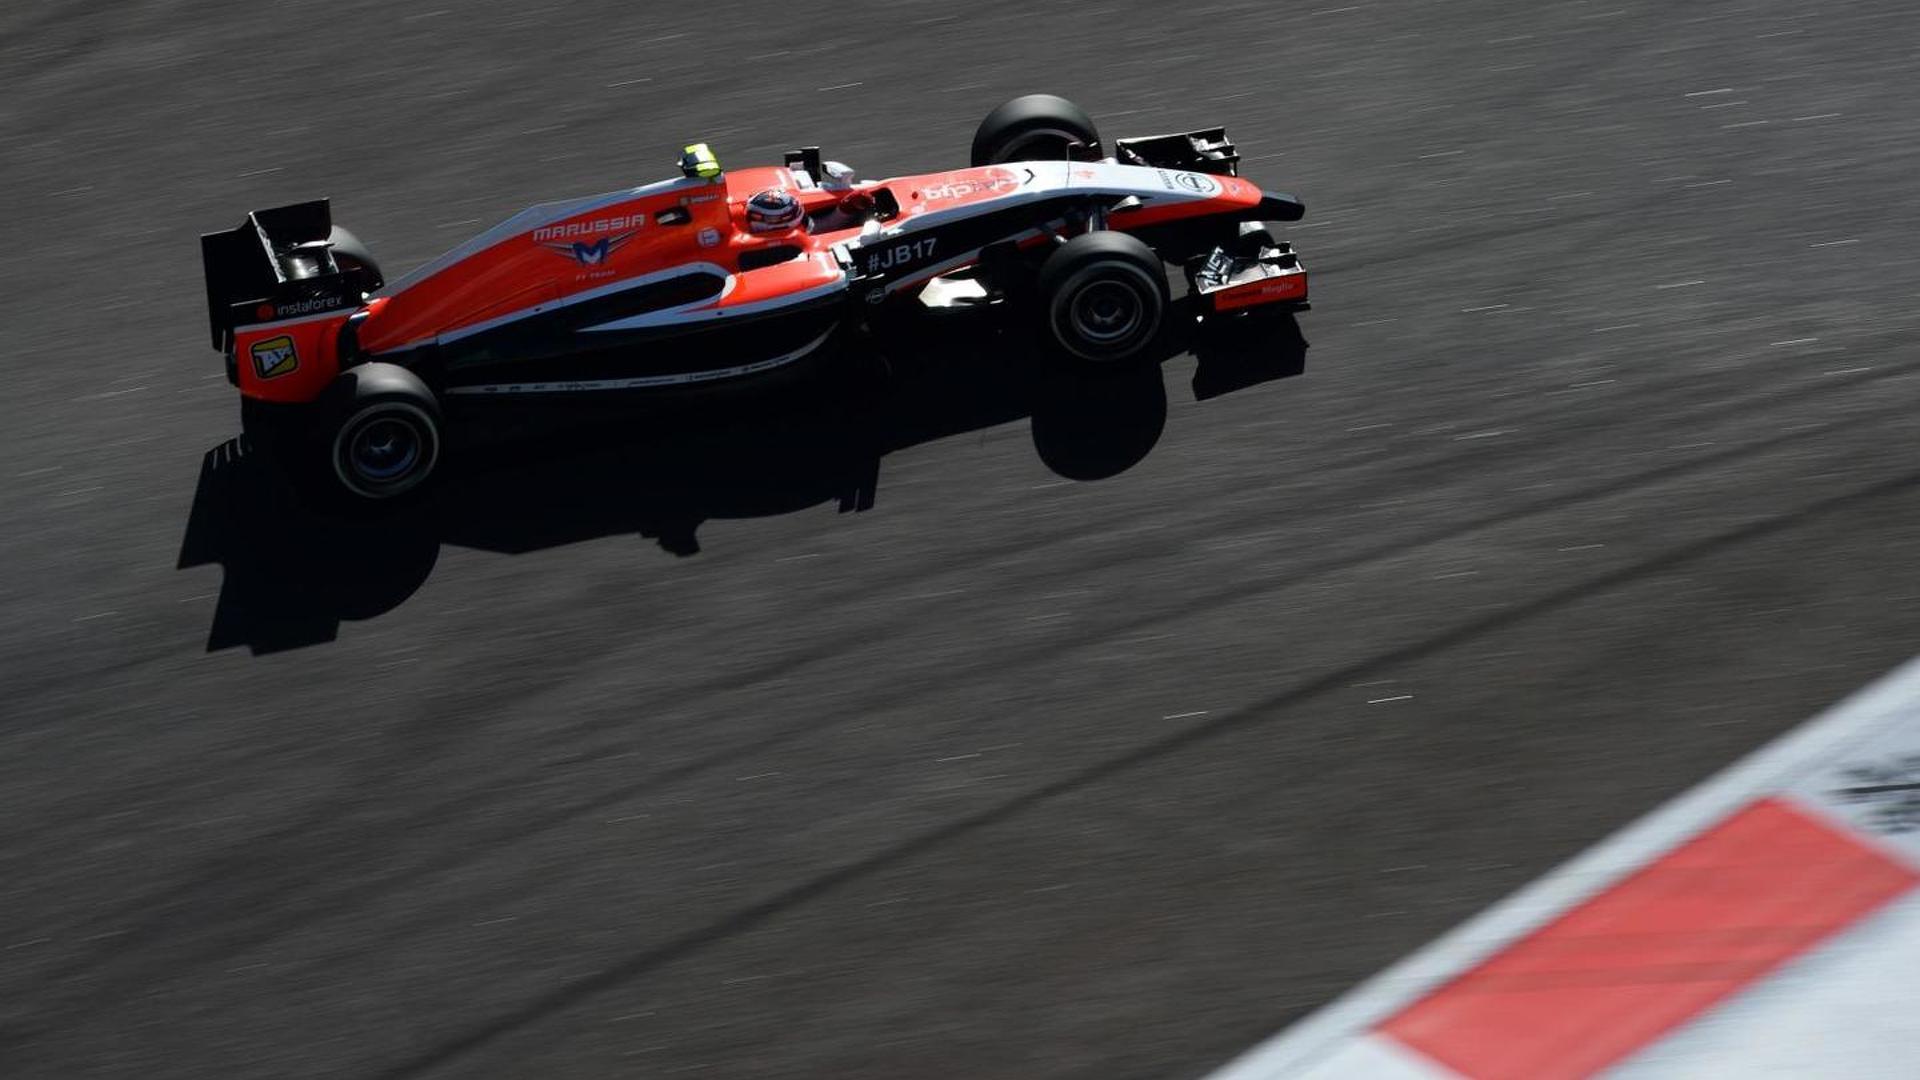 Williams backs Marussia's 2014-car plan